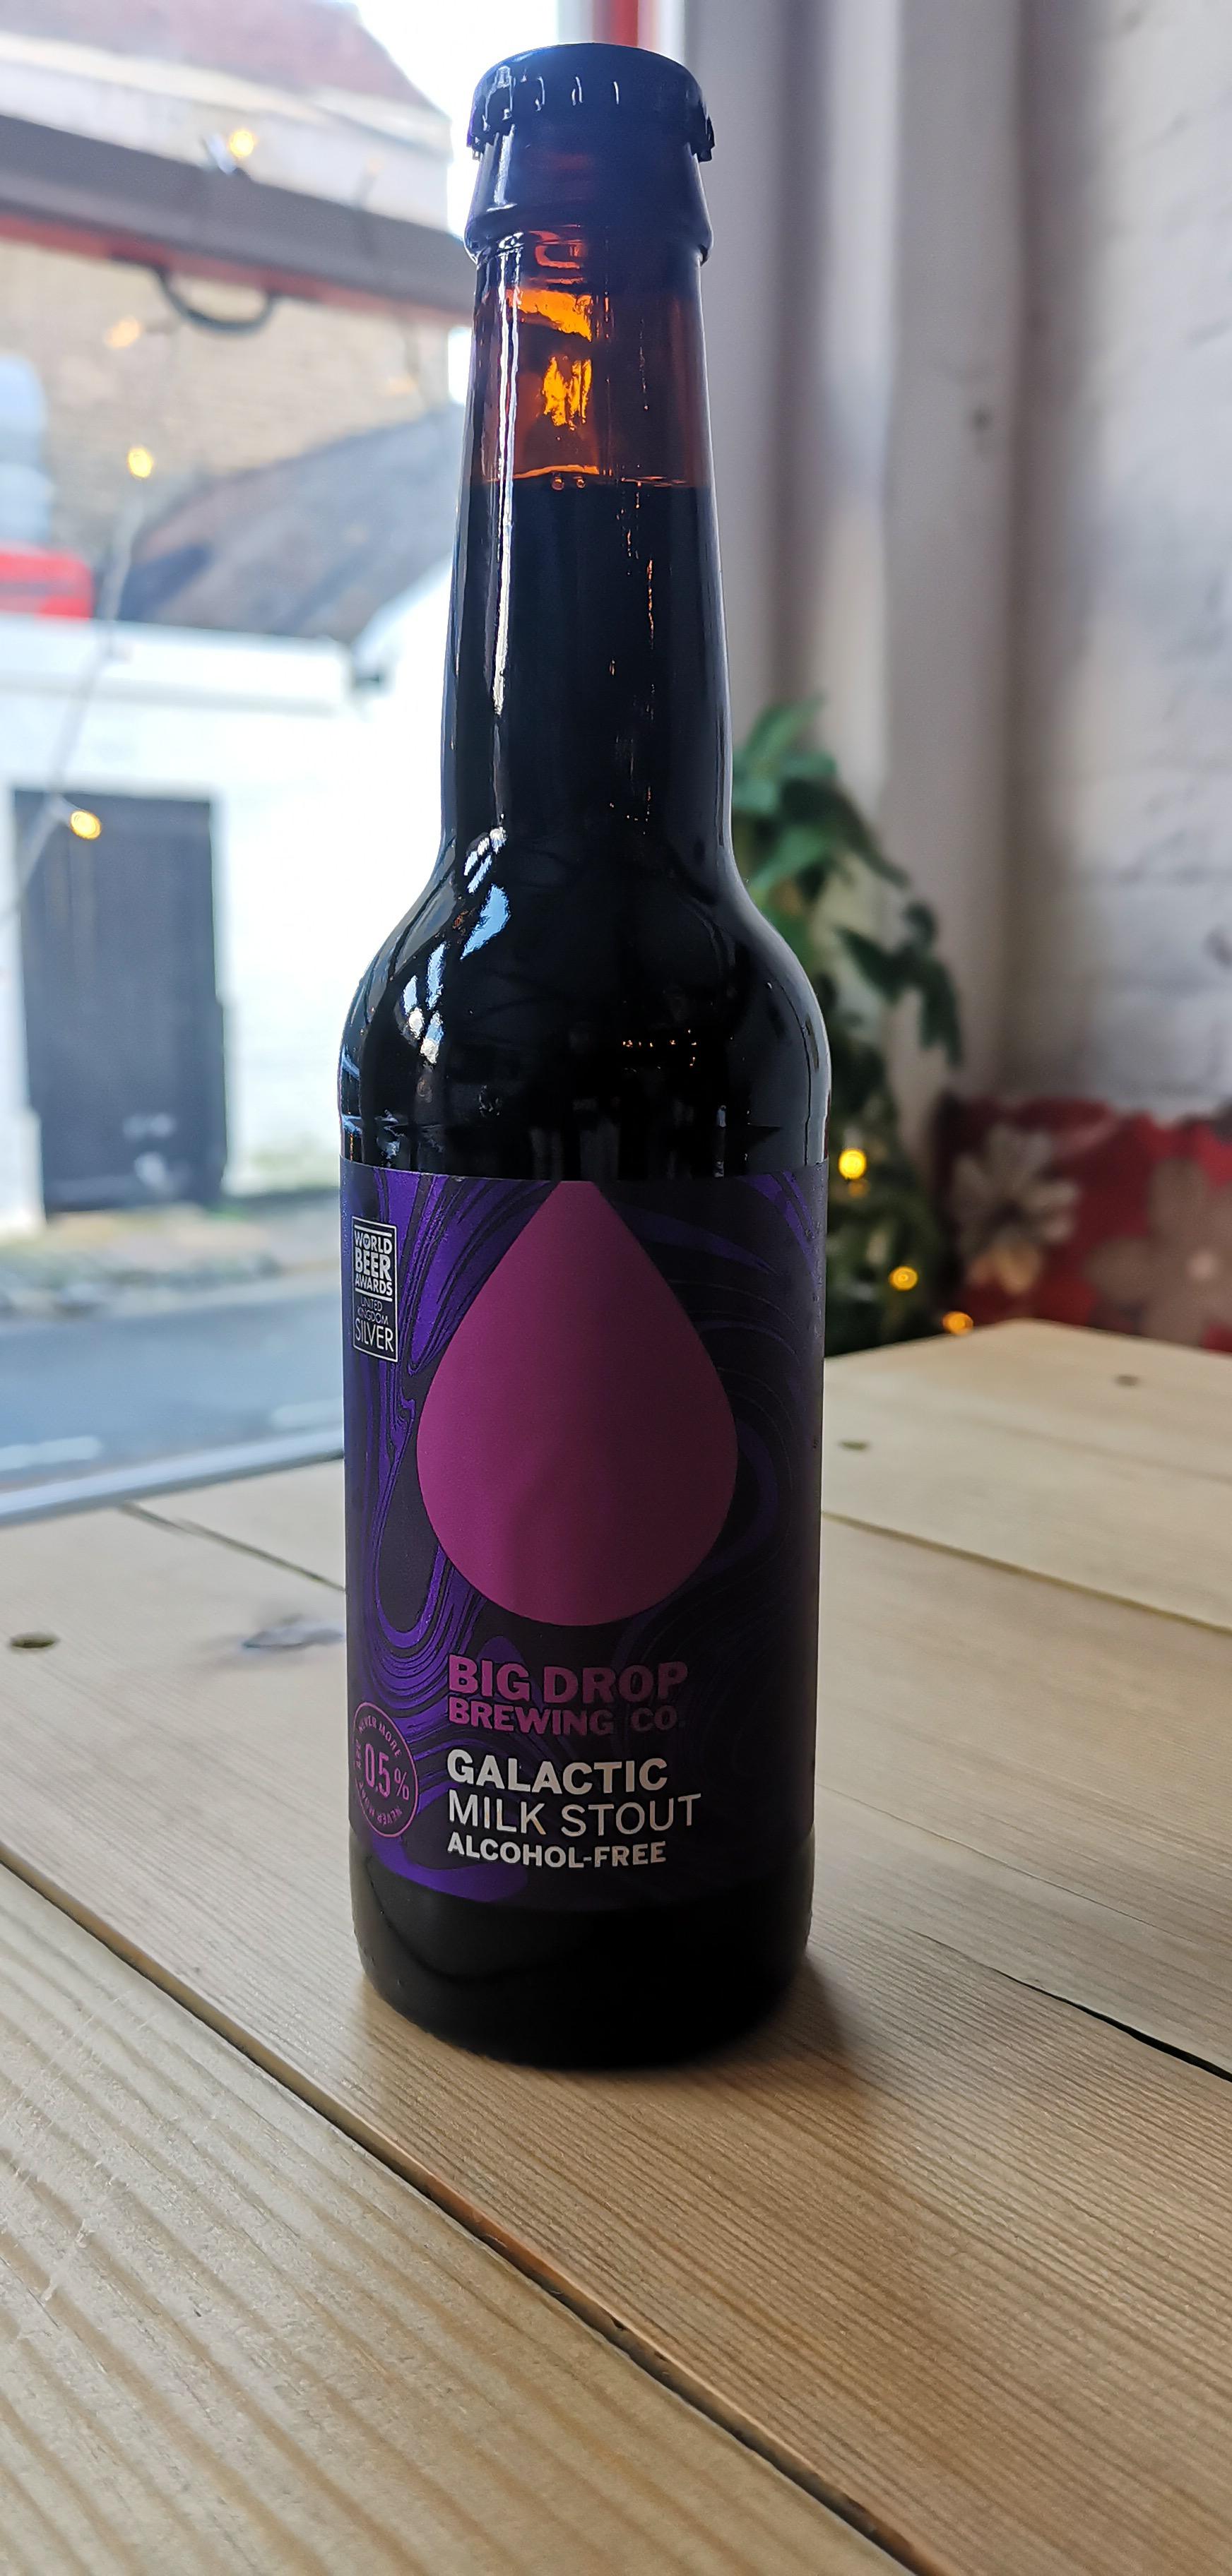 Big Drop Brewing Co. - Galactic (0.5% Milk Stout)